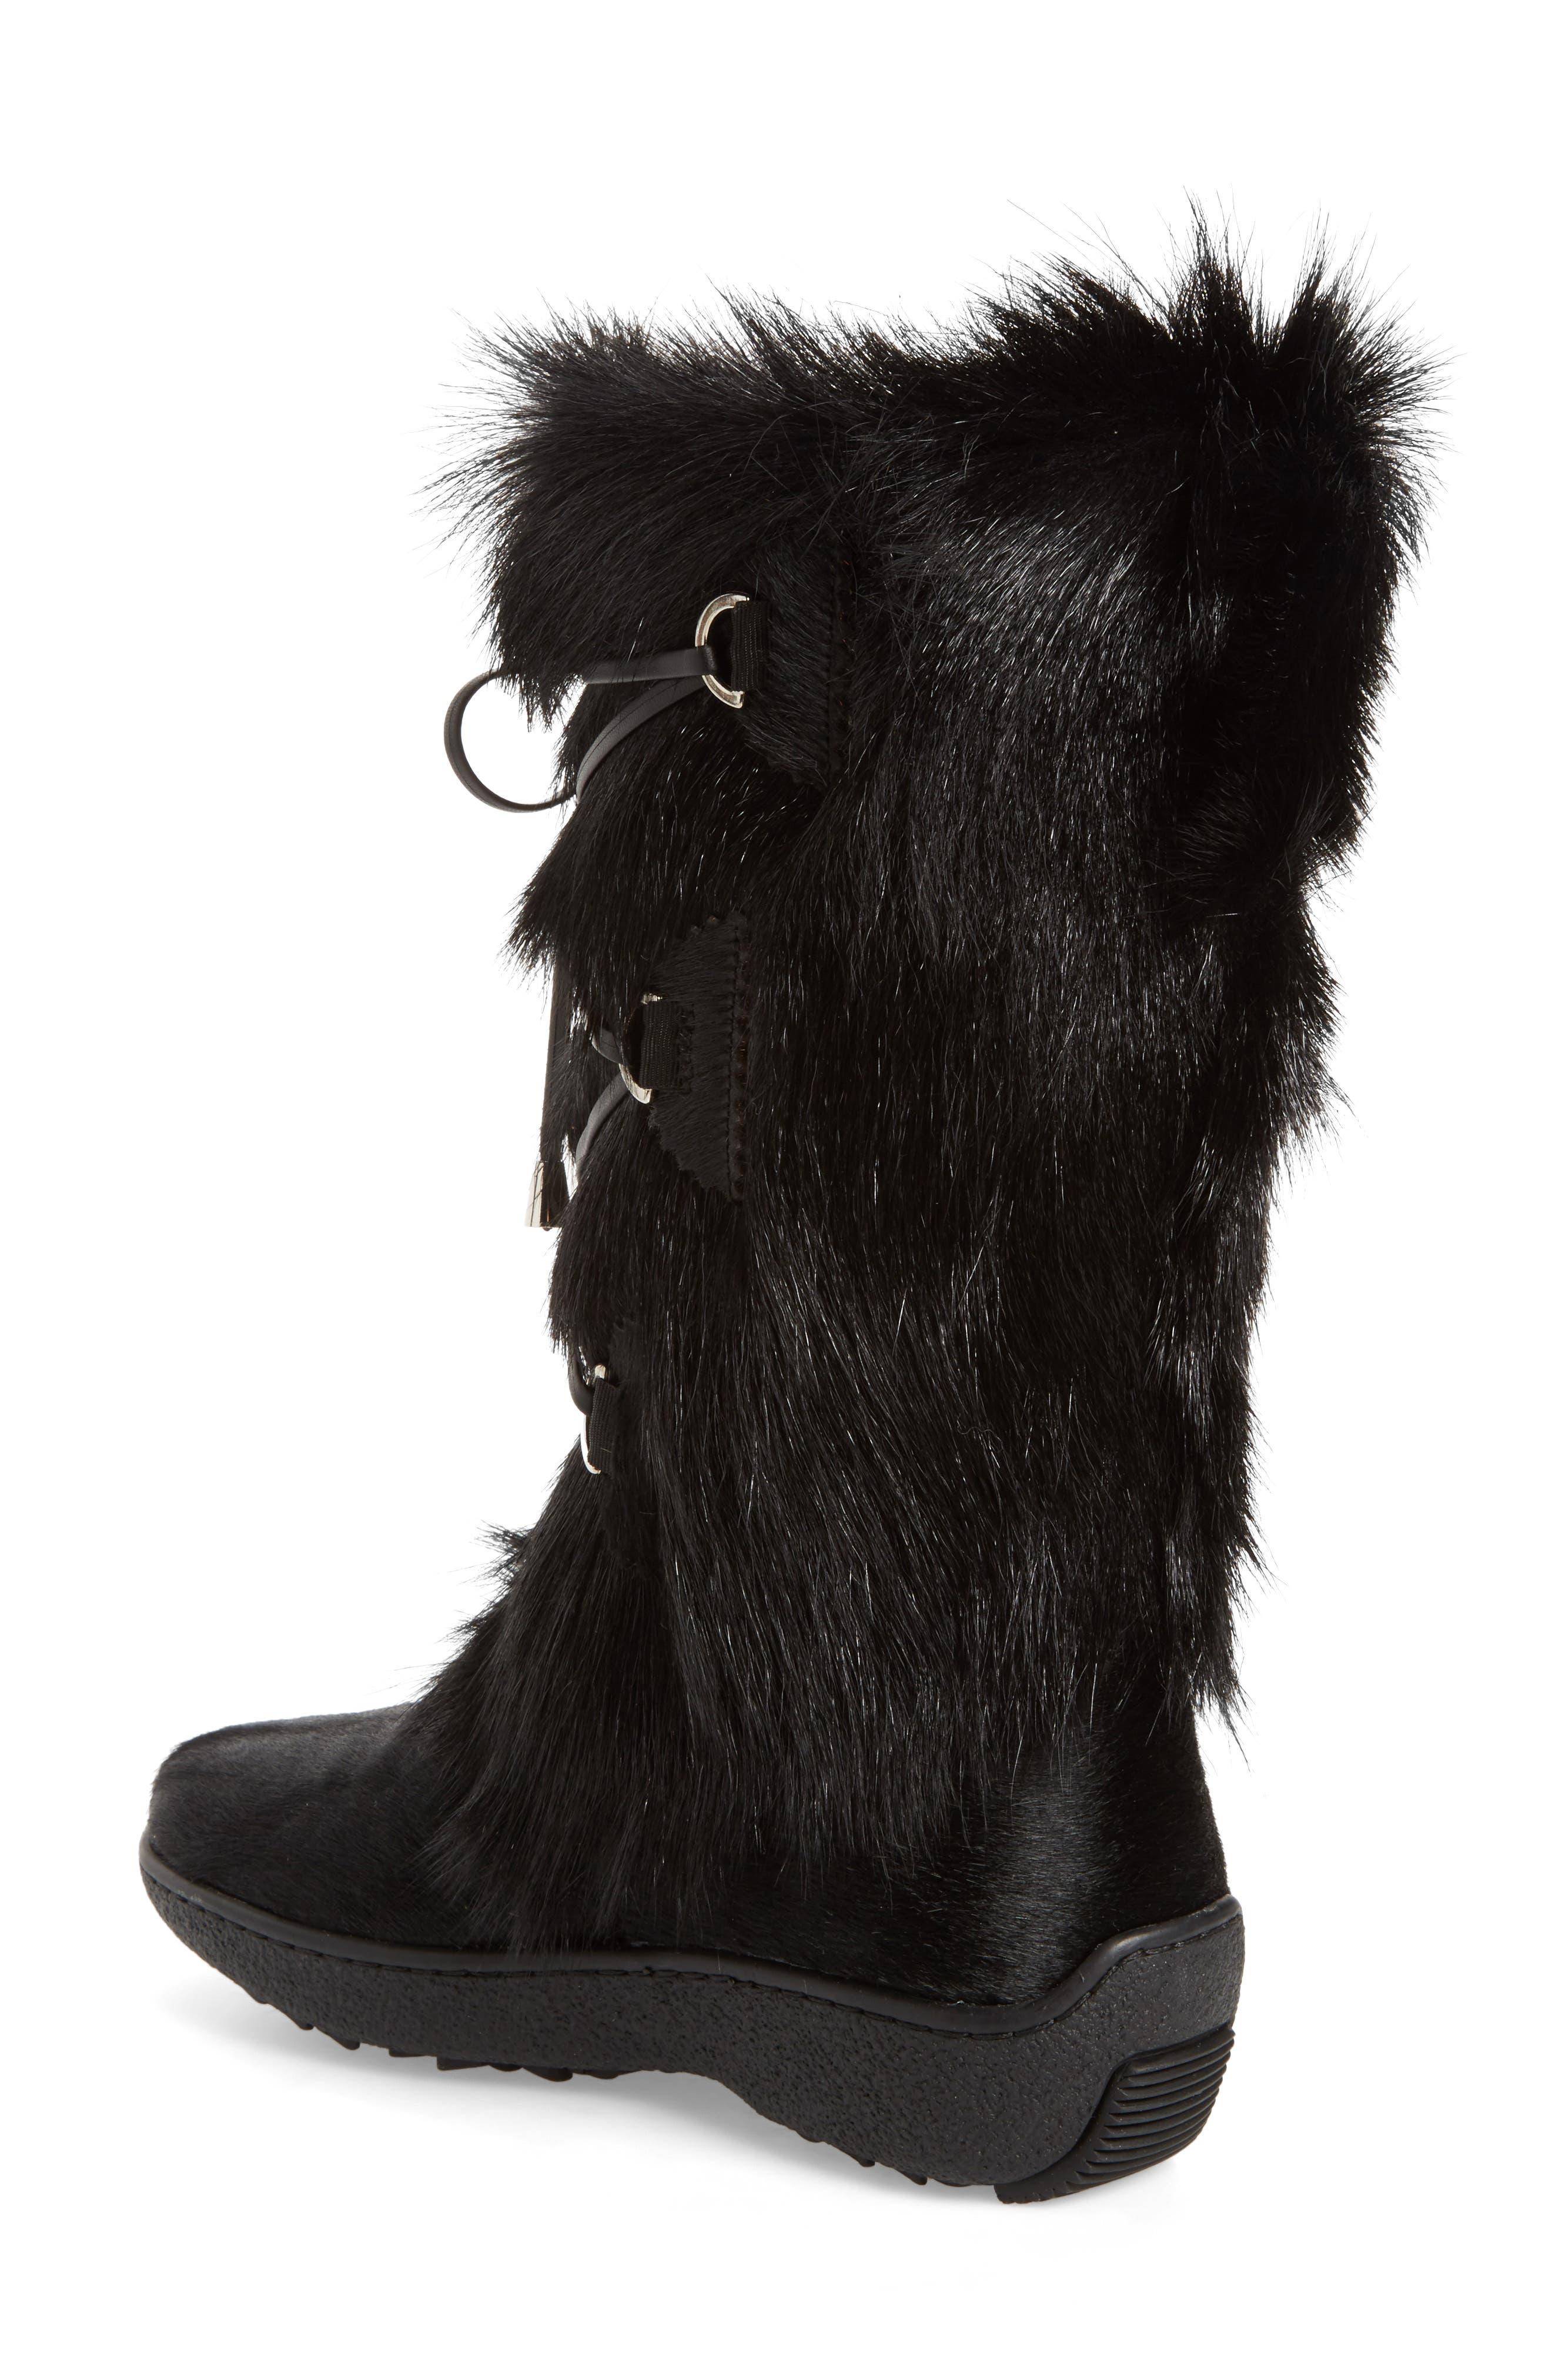 Davos Genuine Goat Fur Boot,                             Alternate thumbnail 2, color,                             001